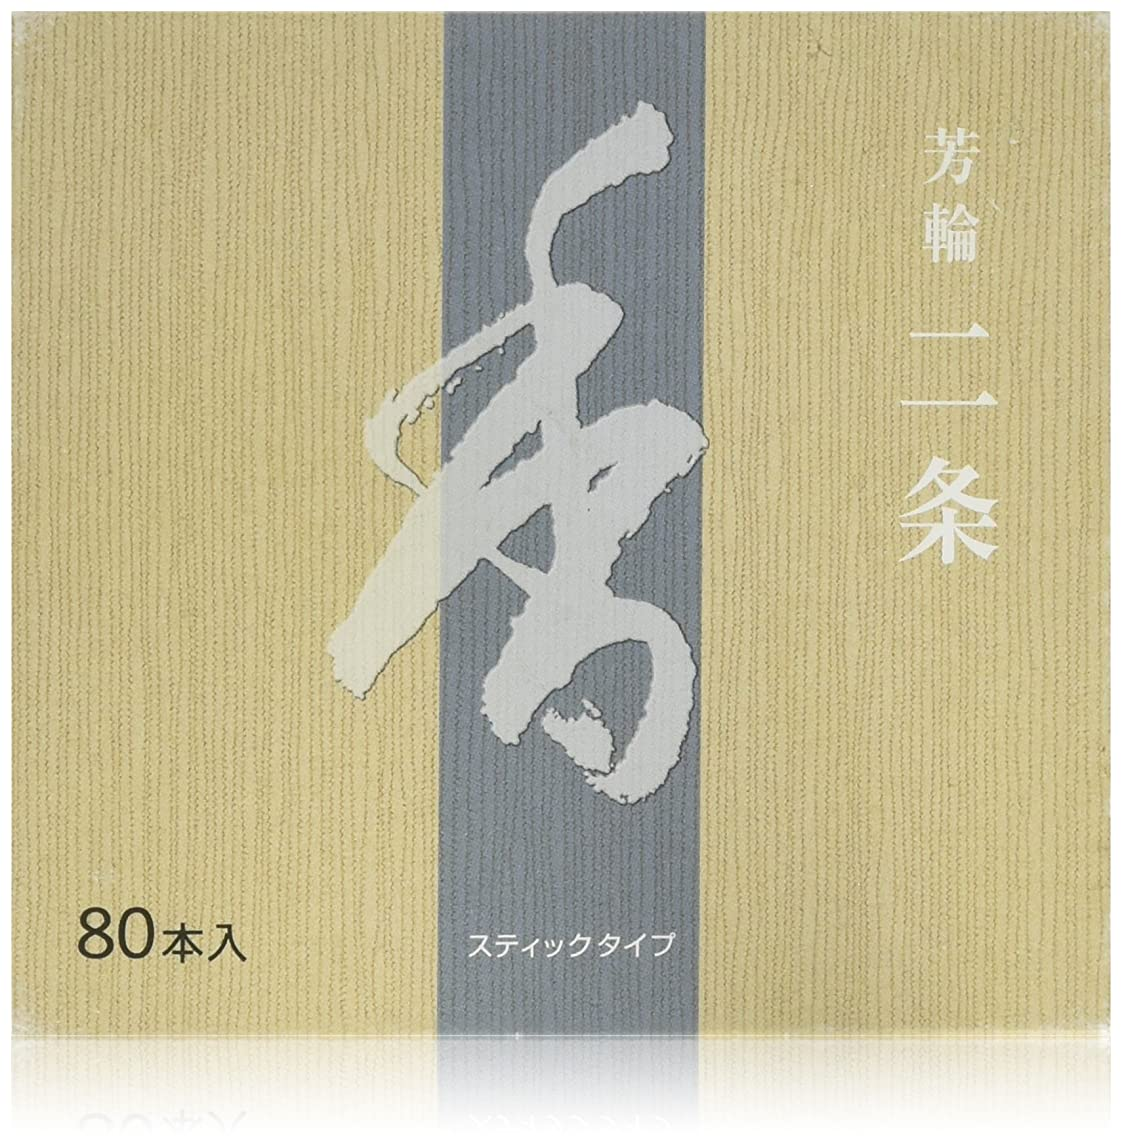 考え累計全国松栄堂のお香 芳輪二条 ST徳用80本入 簡易香立付 #210124